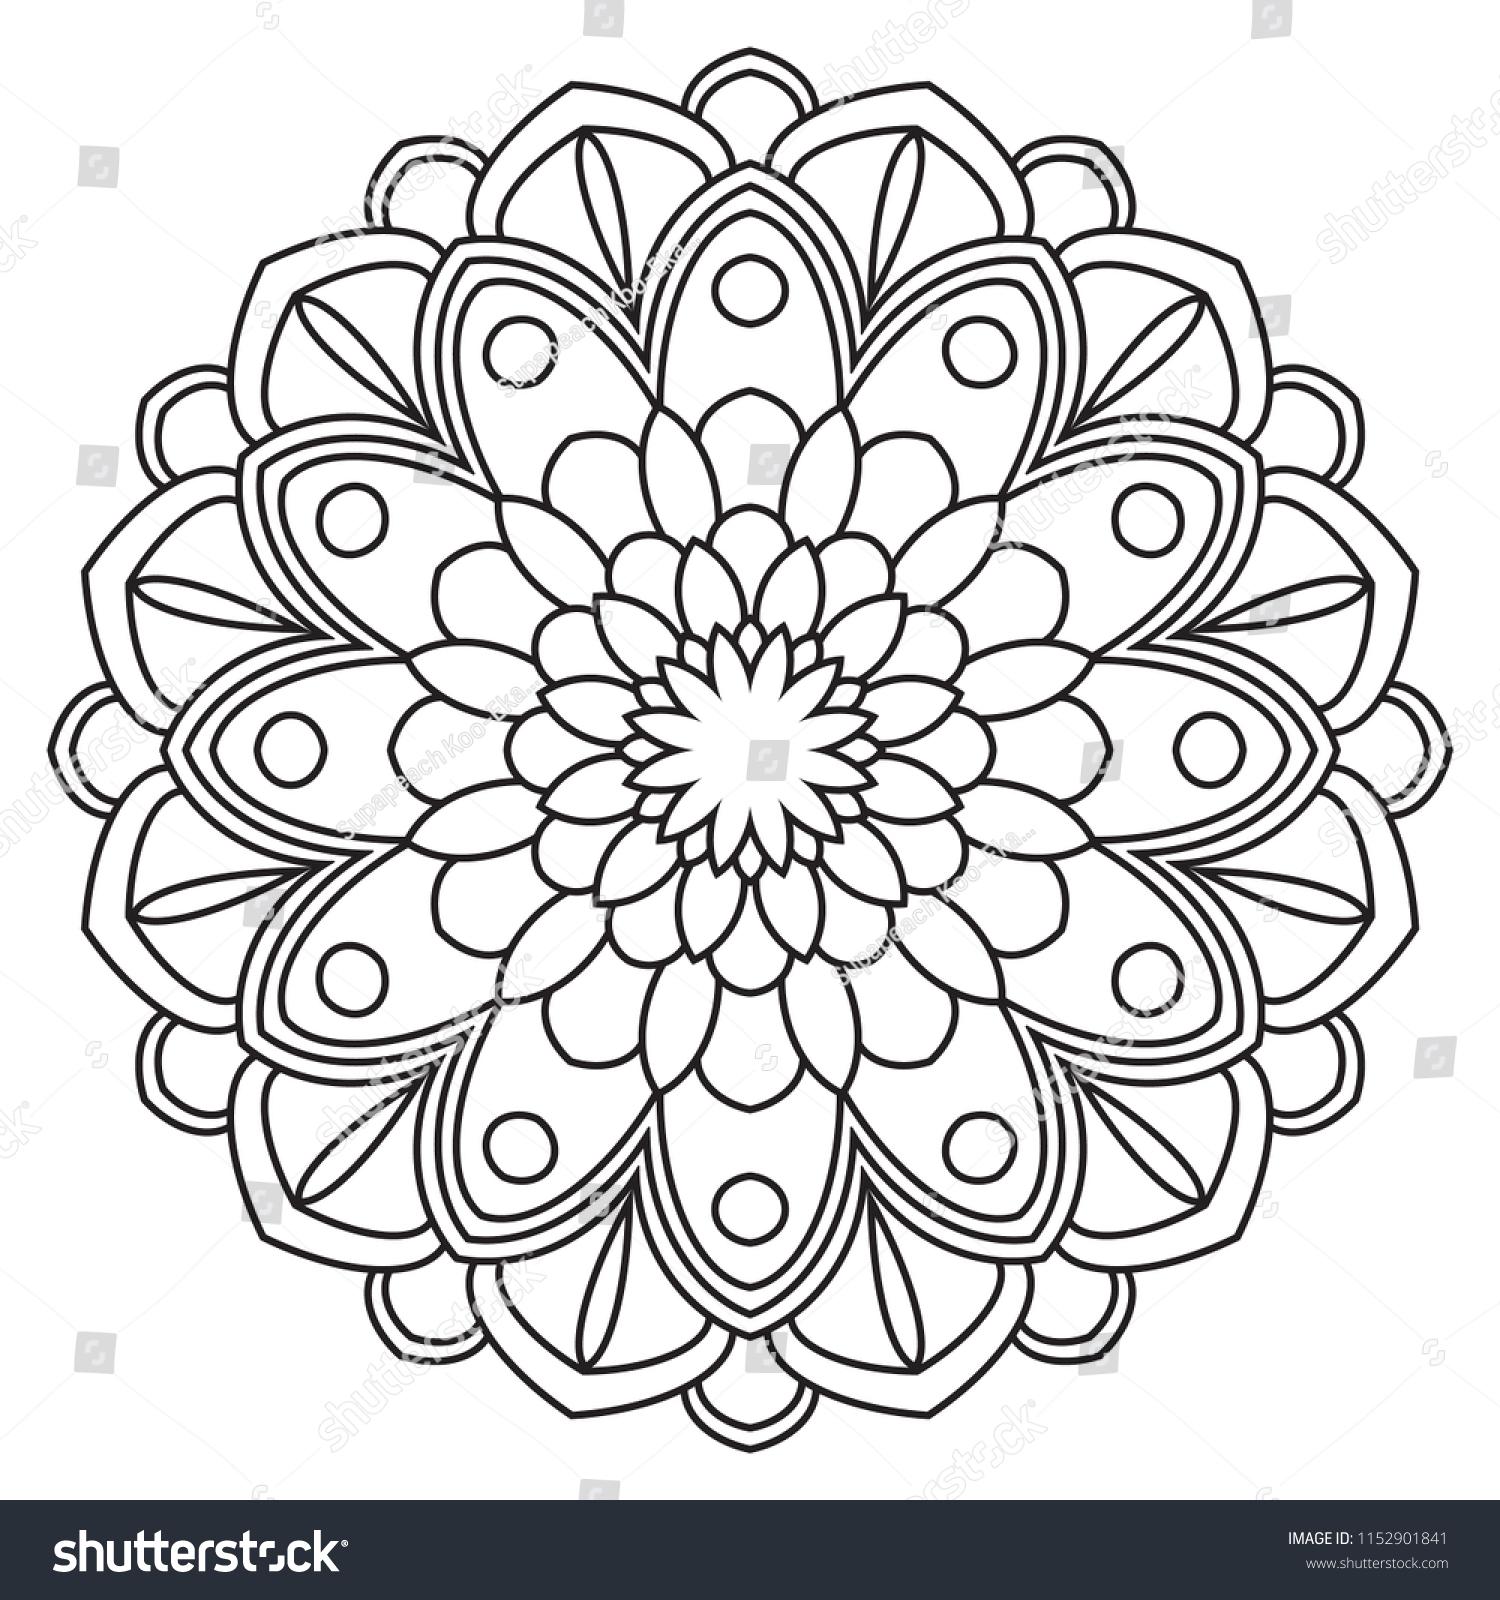 easy mandala coloring pages Easy Mandalas Simple Basic Mandala Beginners Stock Illustration  easy mandala coloring pages